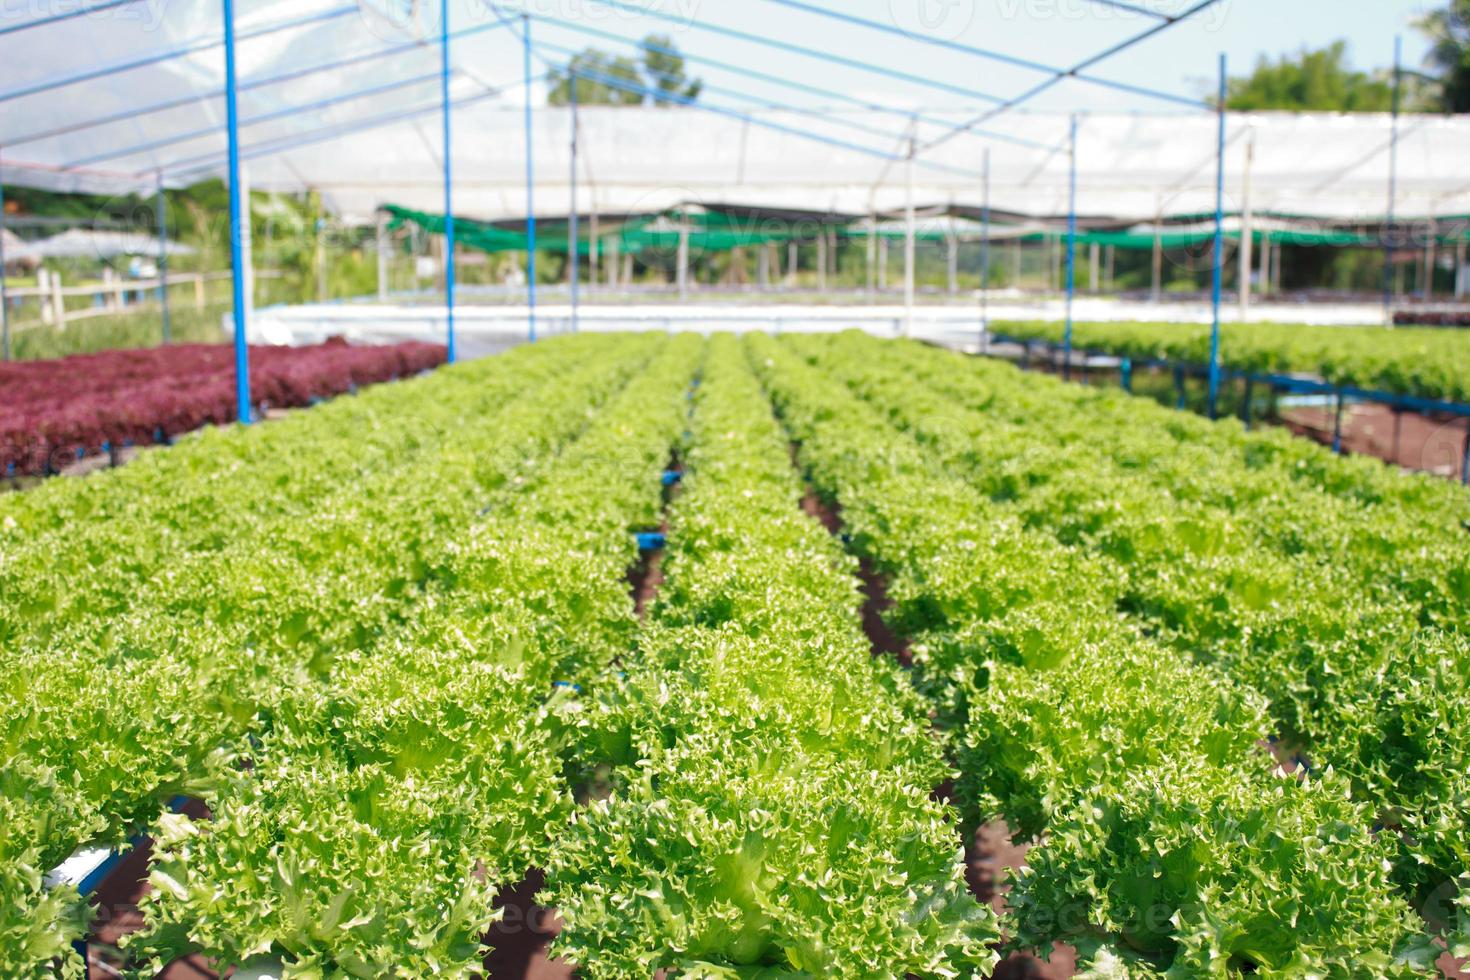 fattoria vegetale idroponica foto